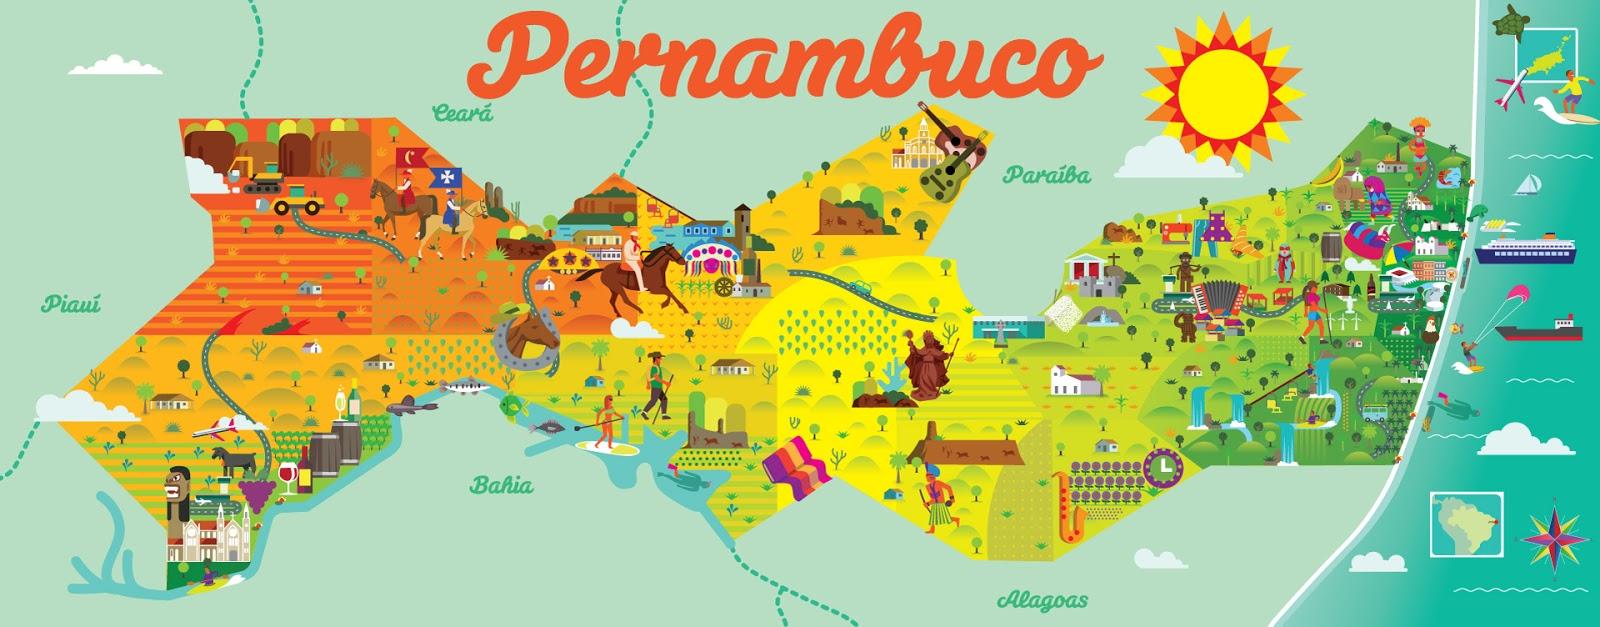 http://www.estrategiaods.org.br/wp-content/uploads/2018/03/mapa-turistico-PE.jpg